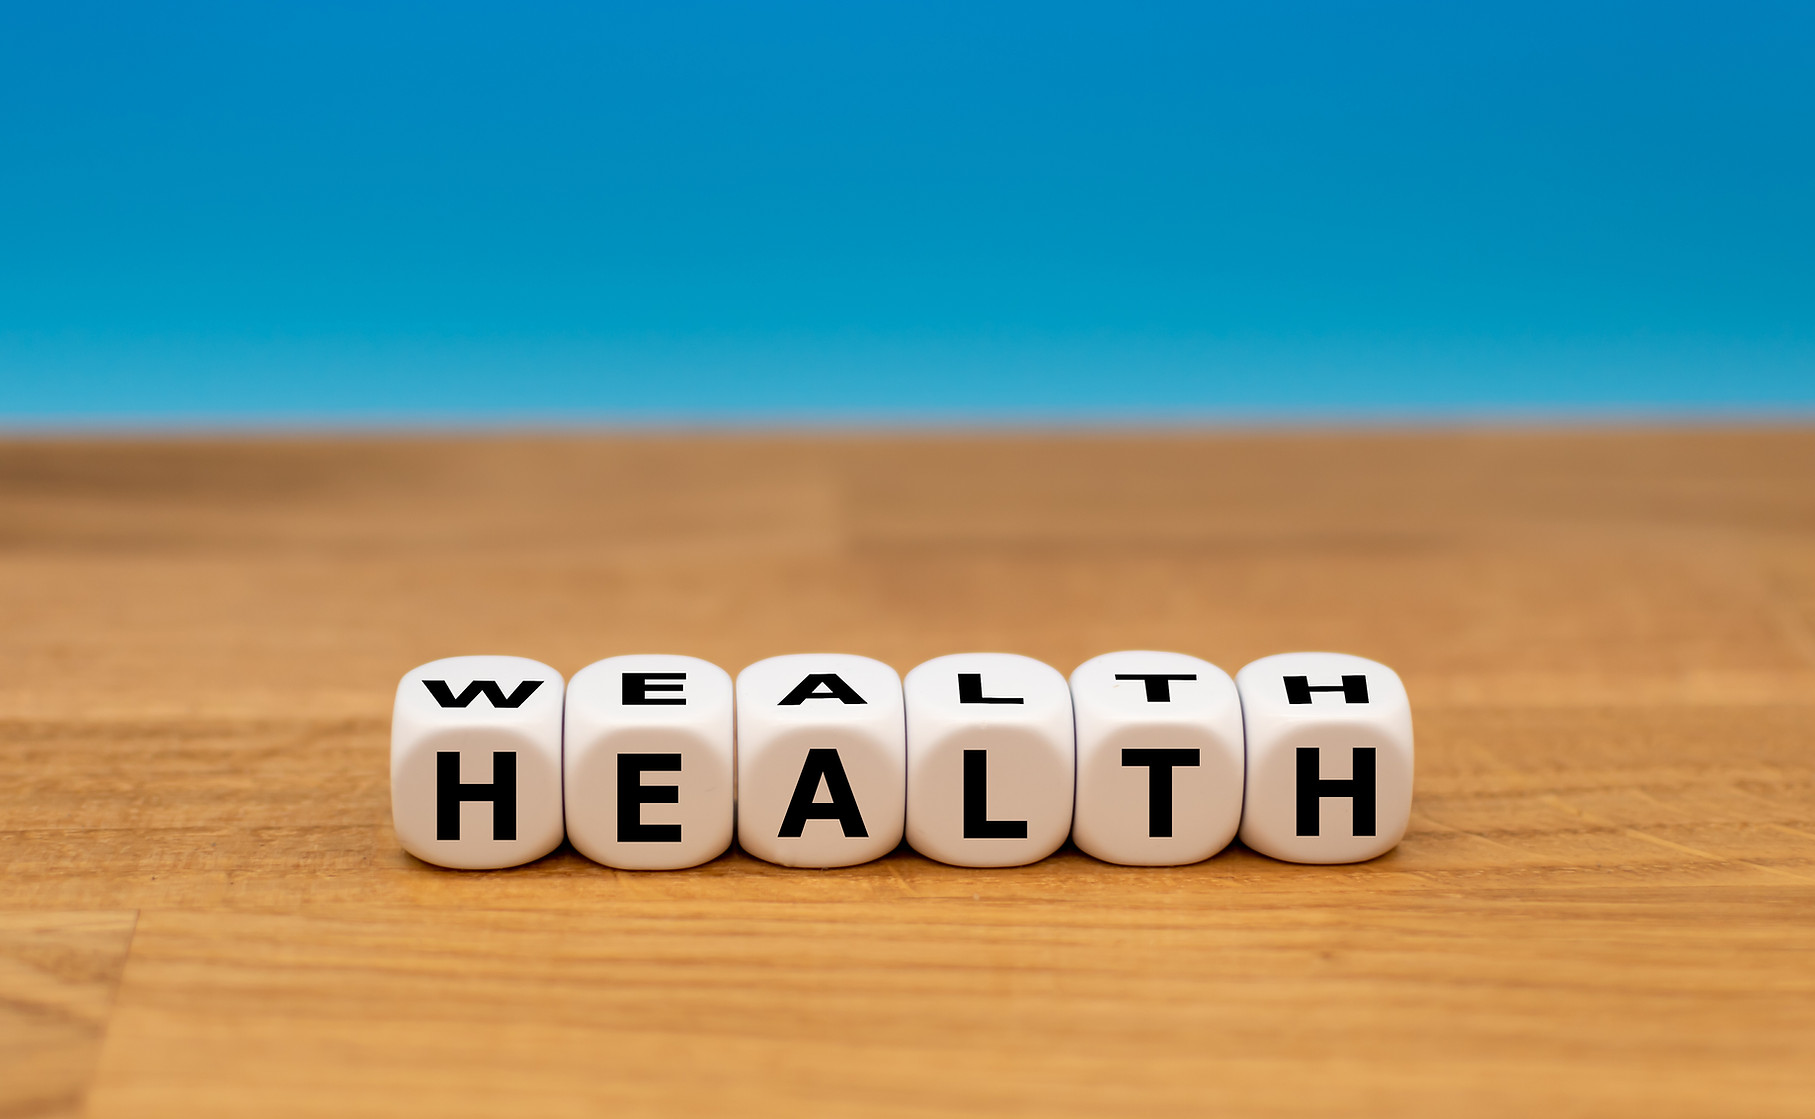 Wealth management in good health